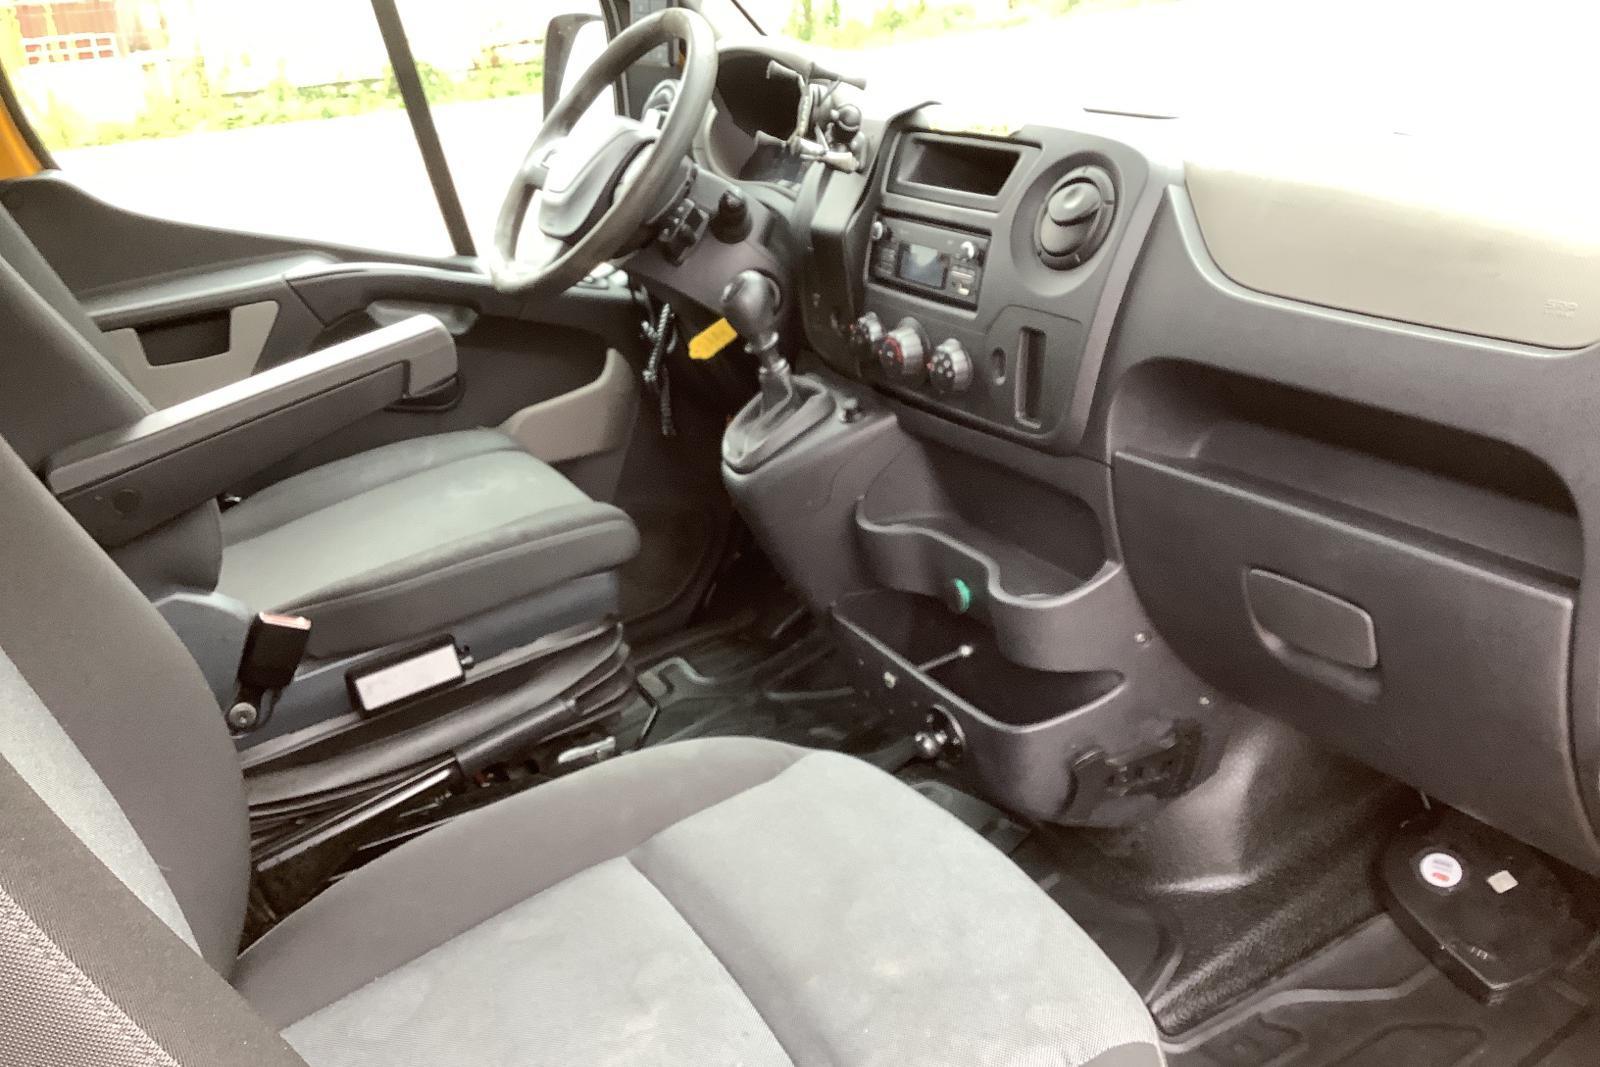 Renault Master 2.3 dCi Pickup/Chassi 2WD (145hk) - 0 mil - Manuell - röd - 2016